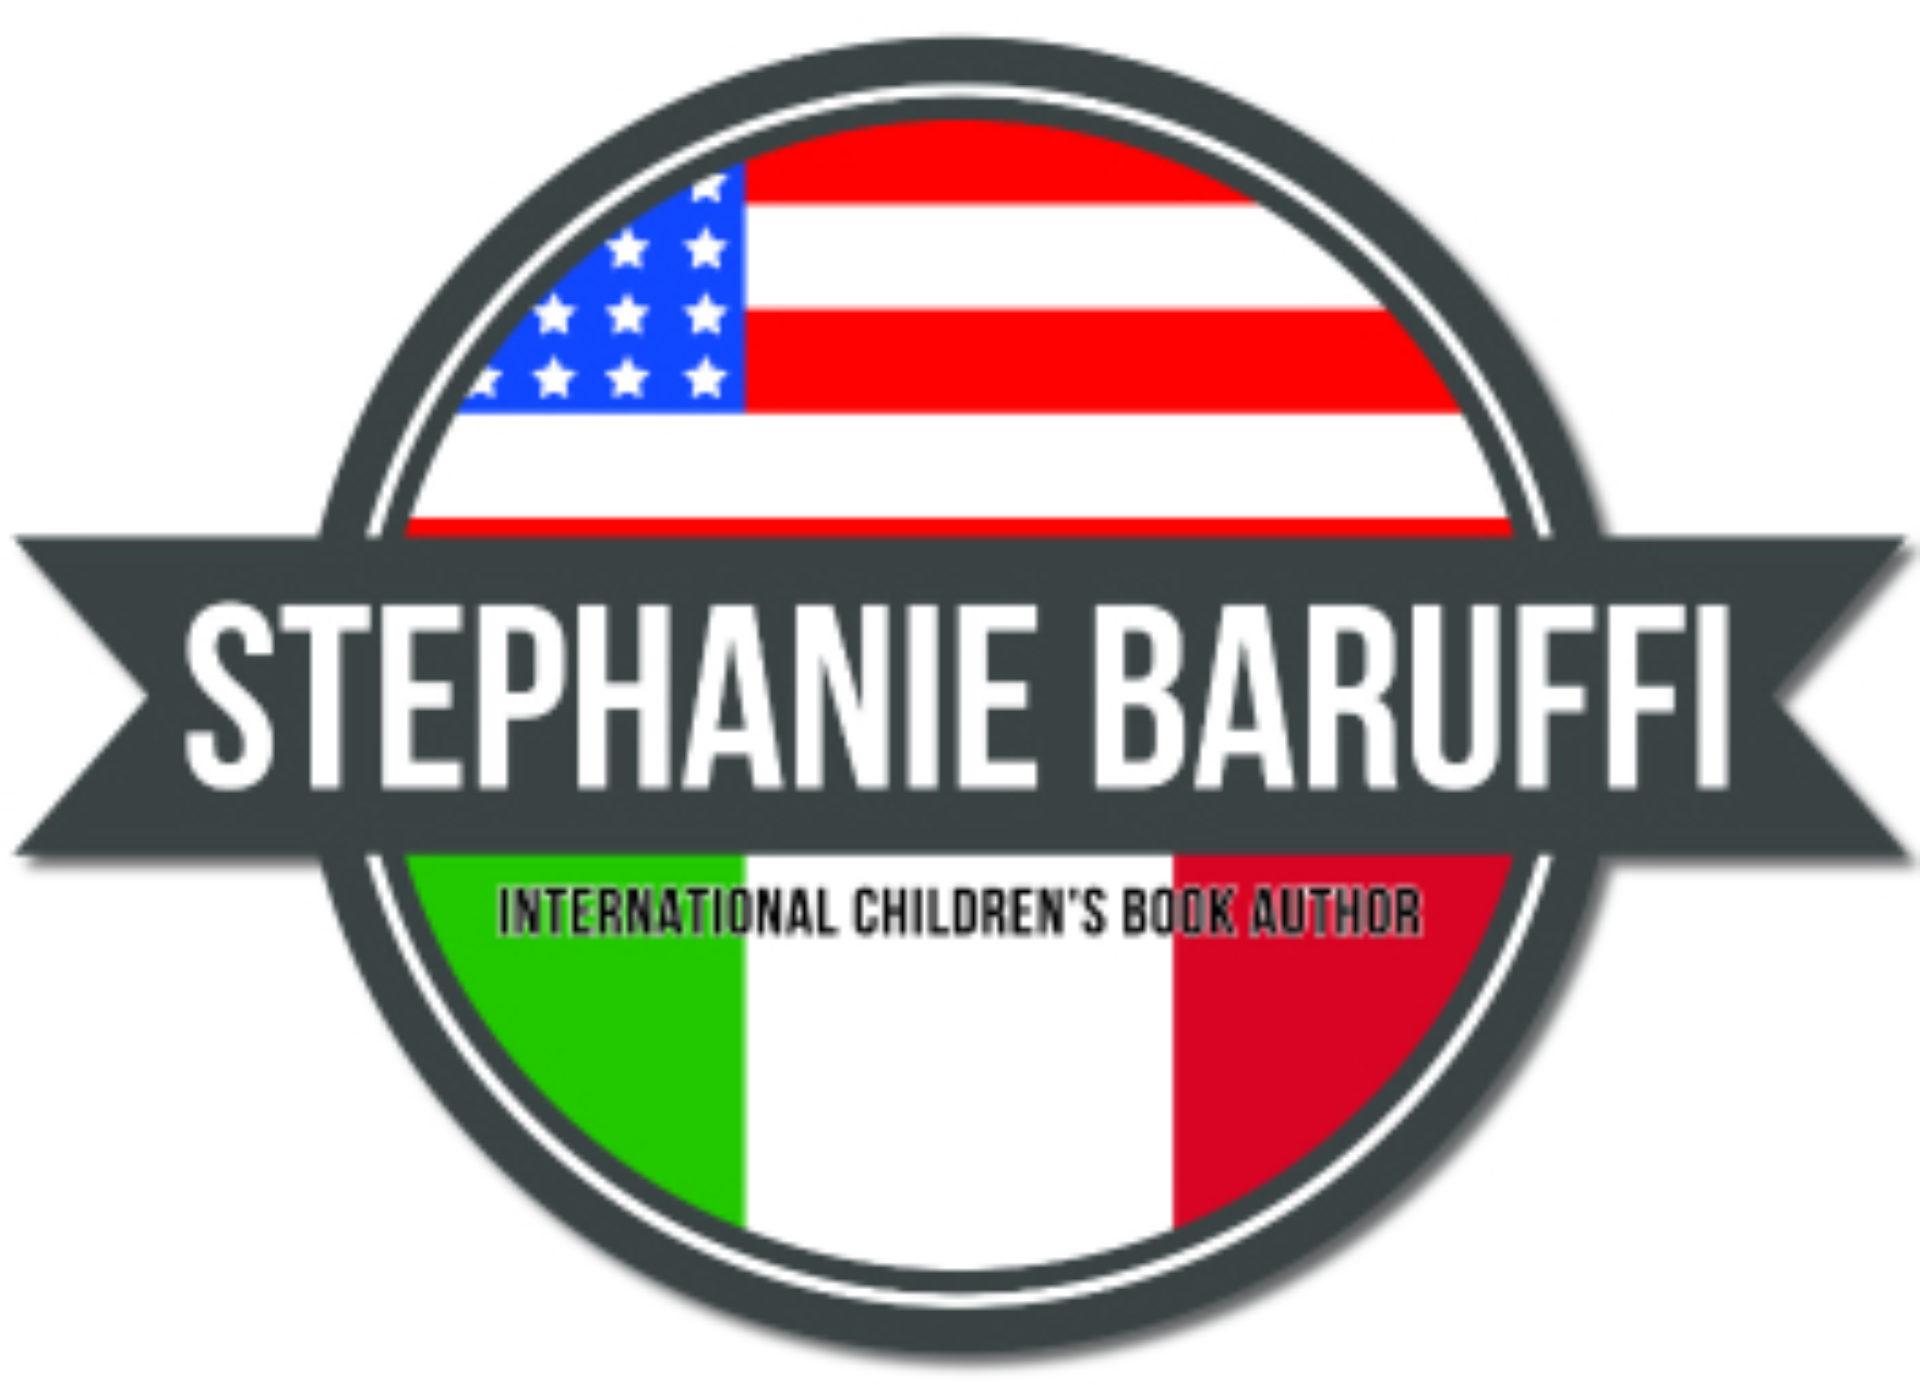 Stephanie Baruffi